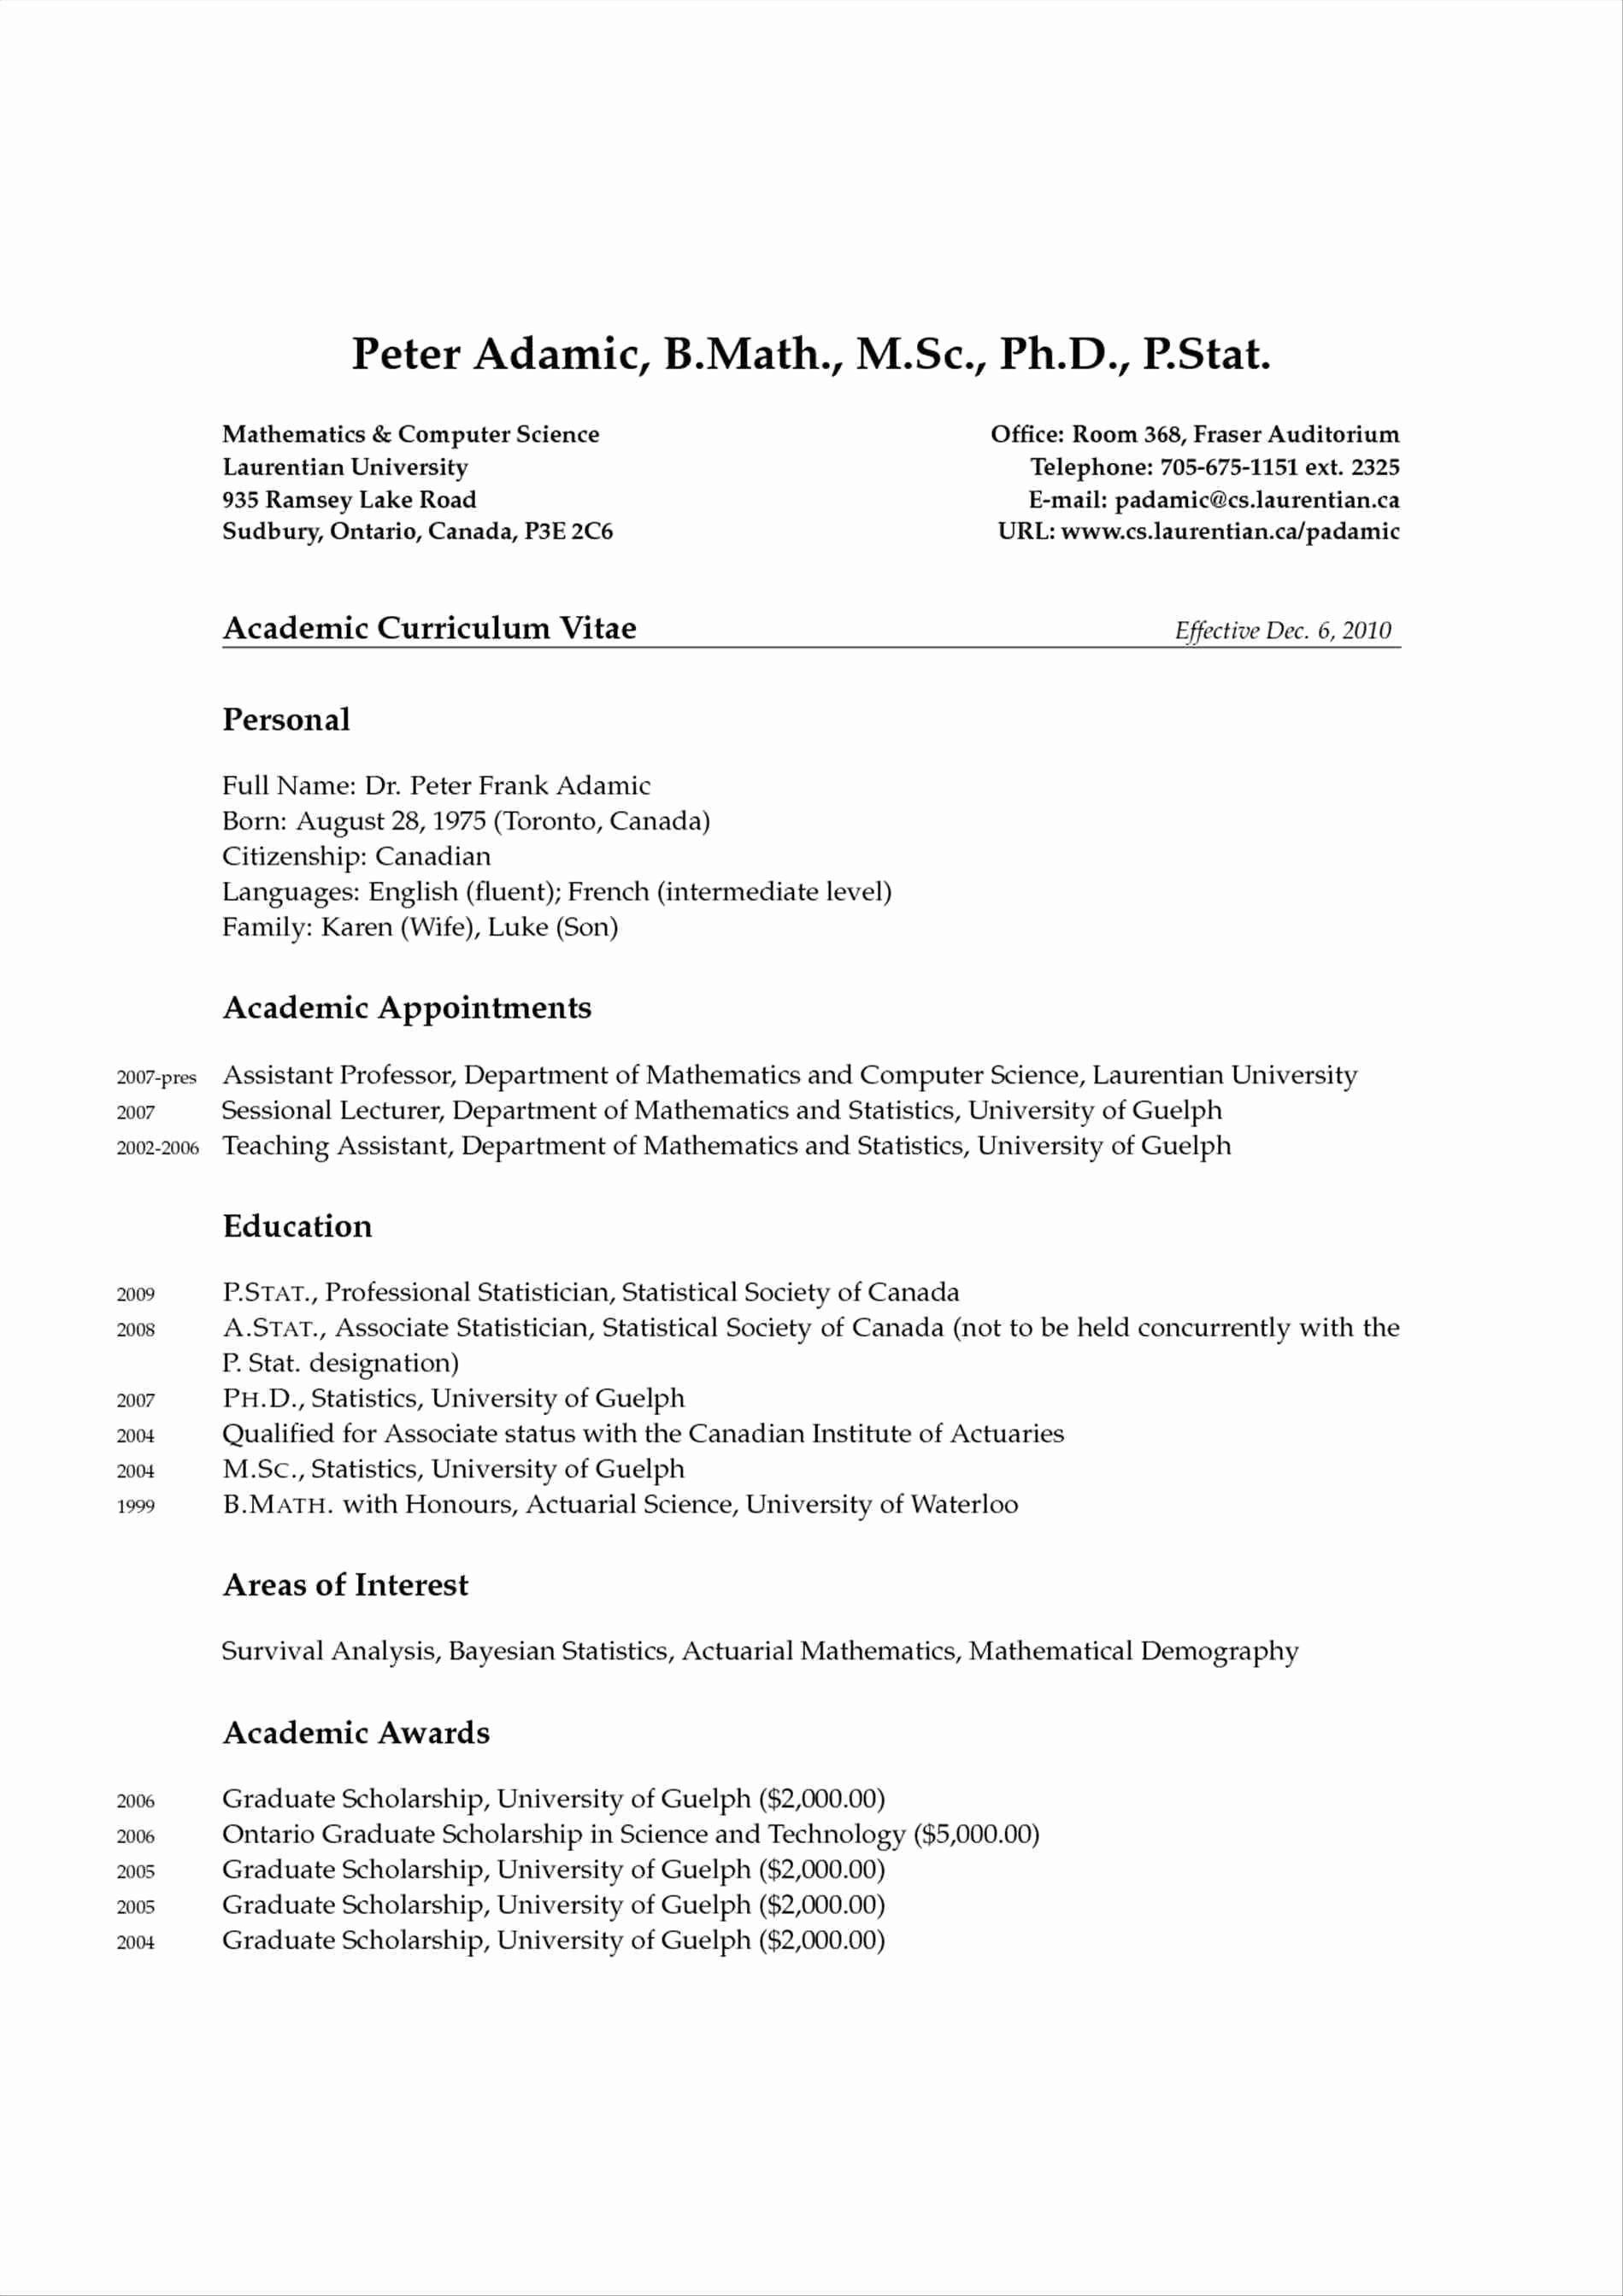 Cv Template Phd , cvtemplate template Job cover letter